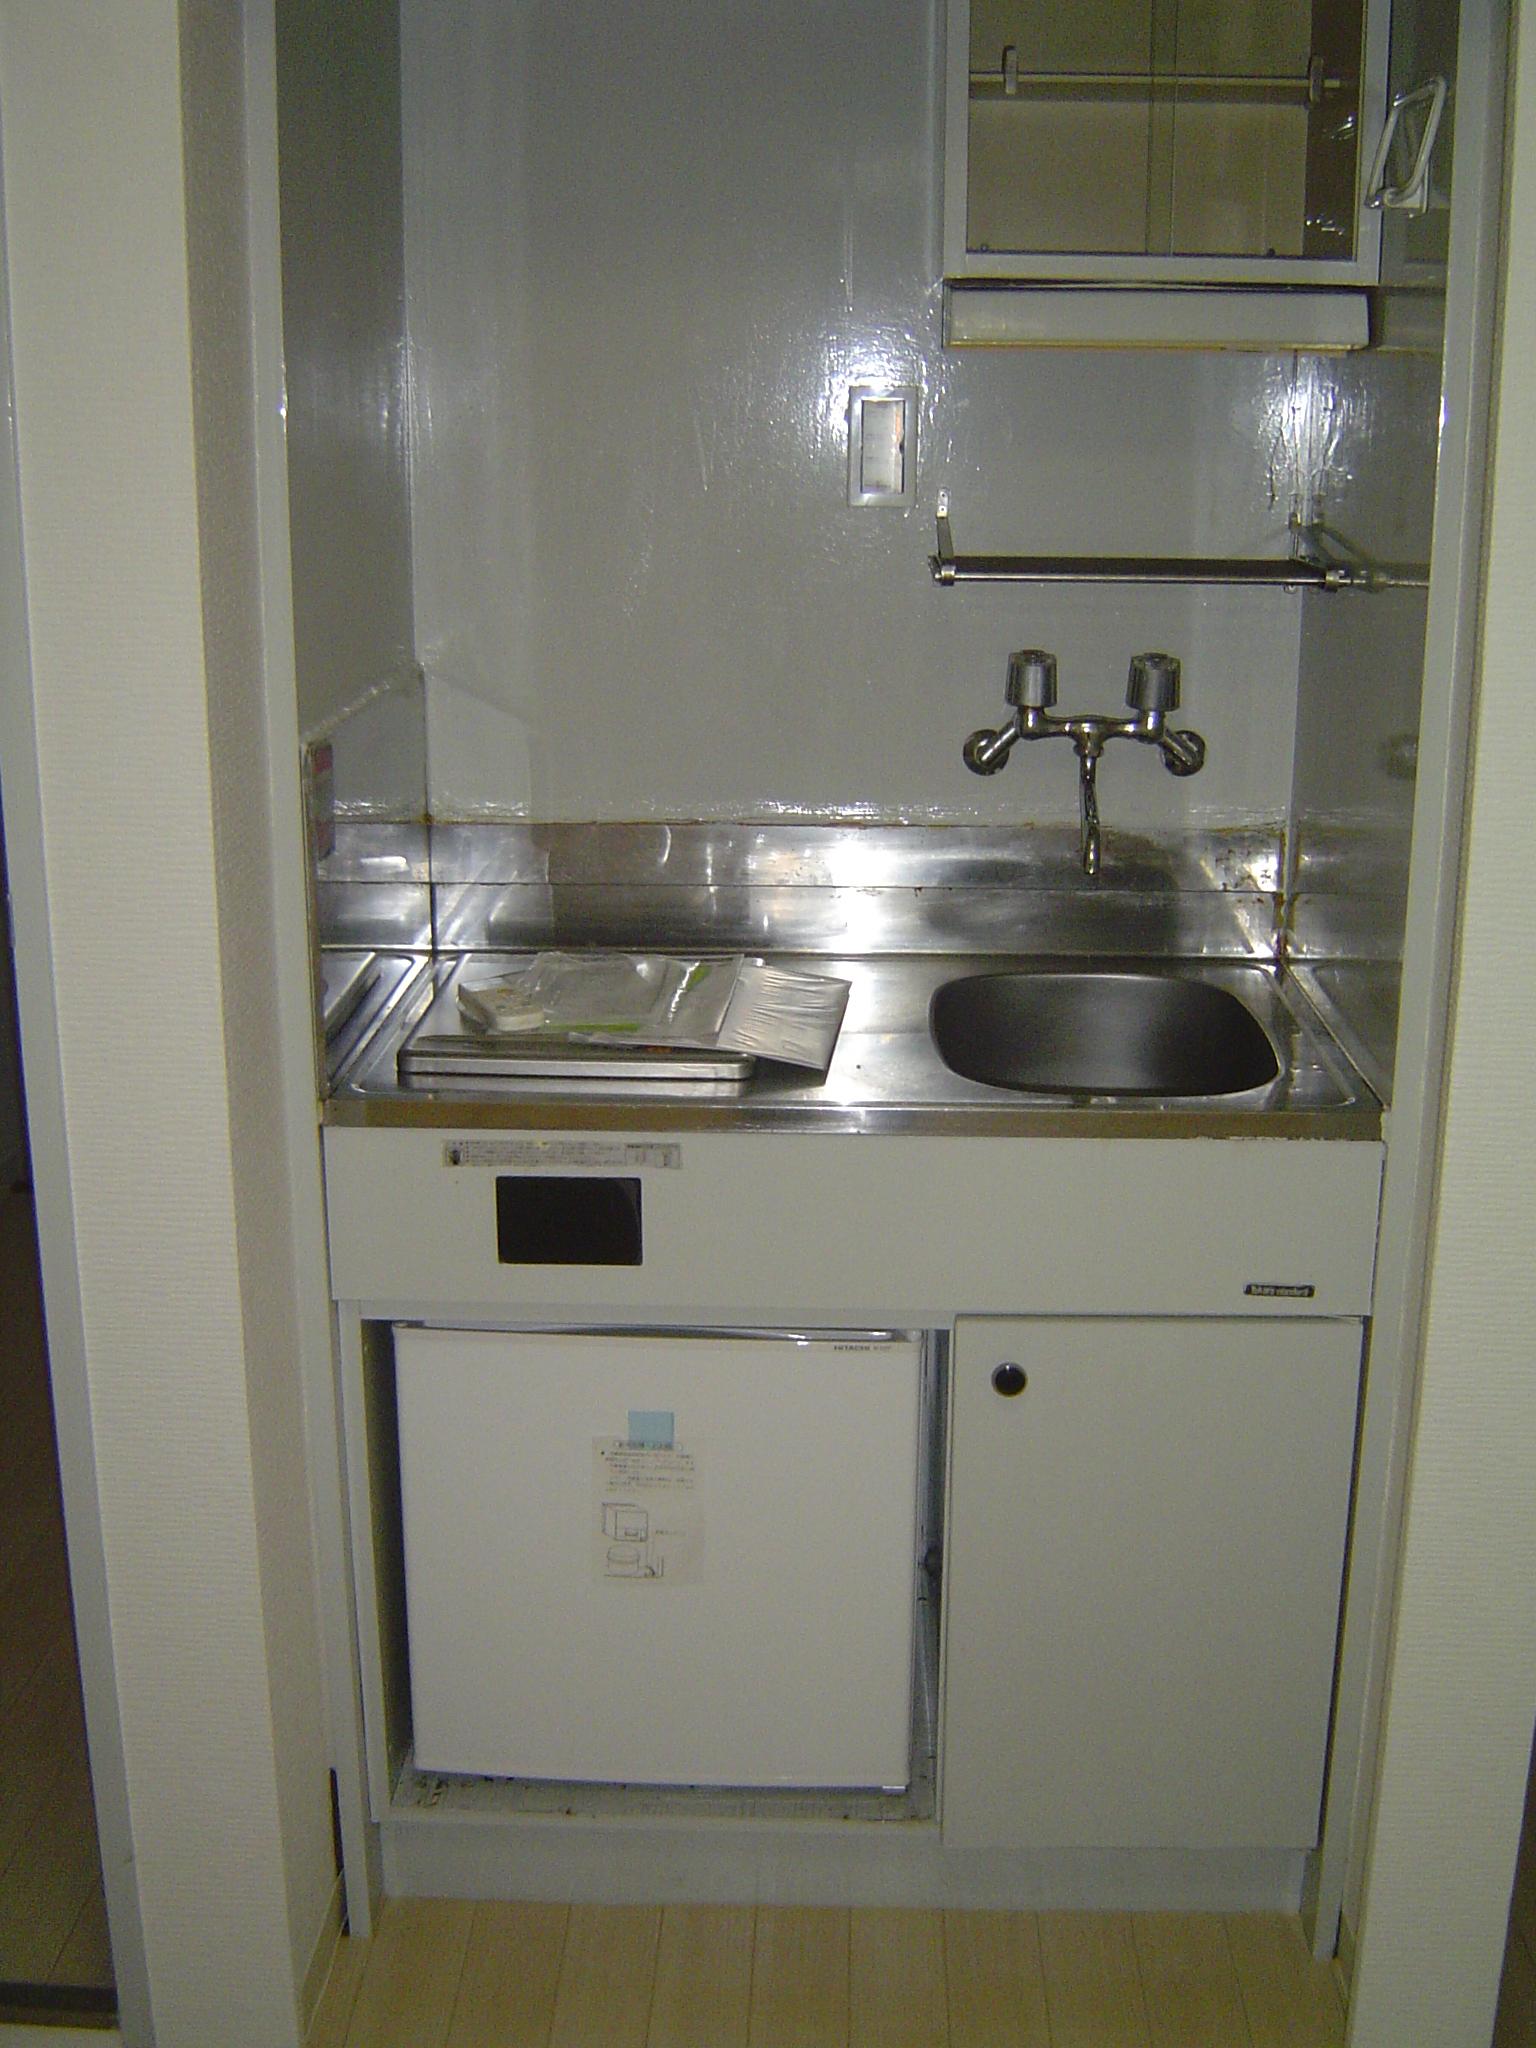 DSC07638.JPG